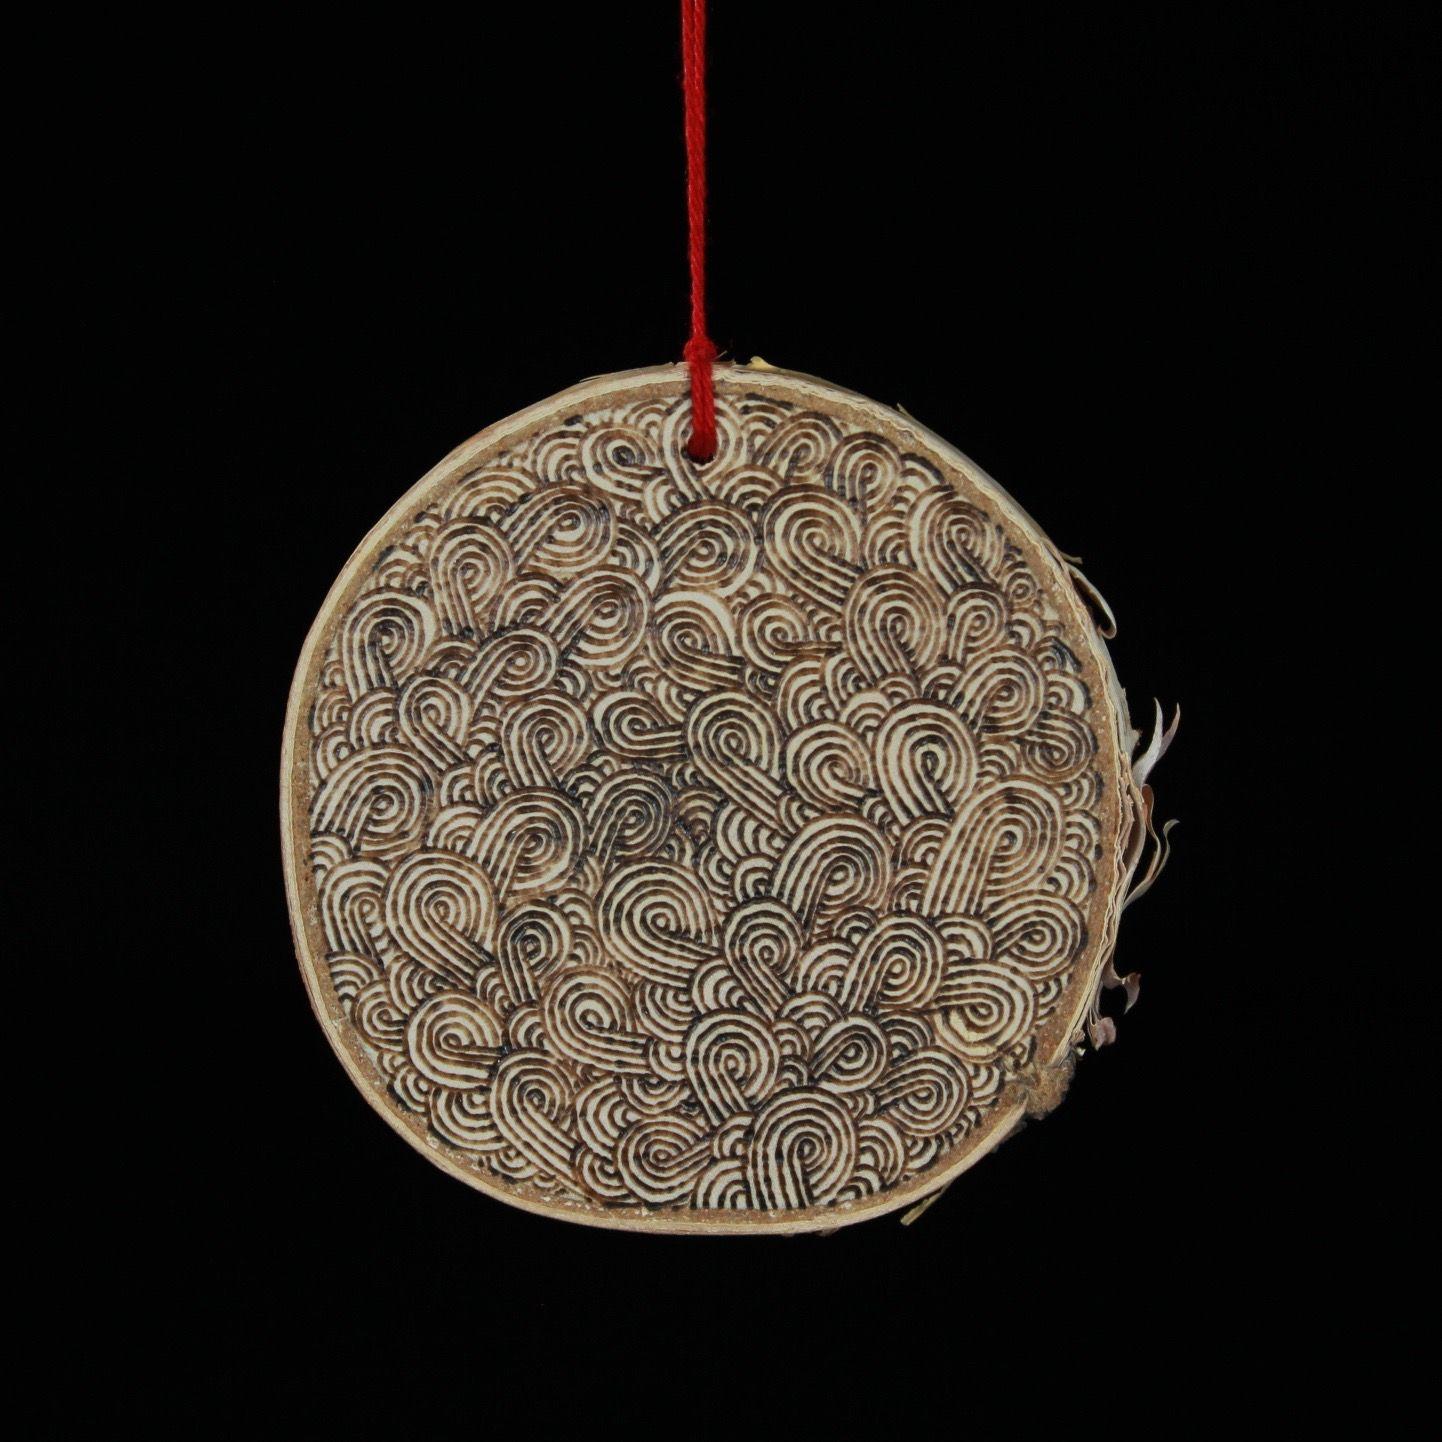 Swirly Ornament